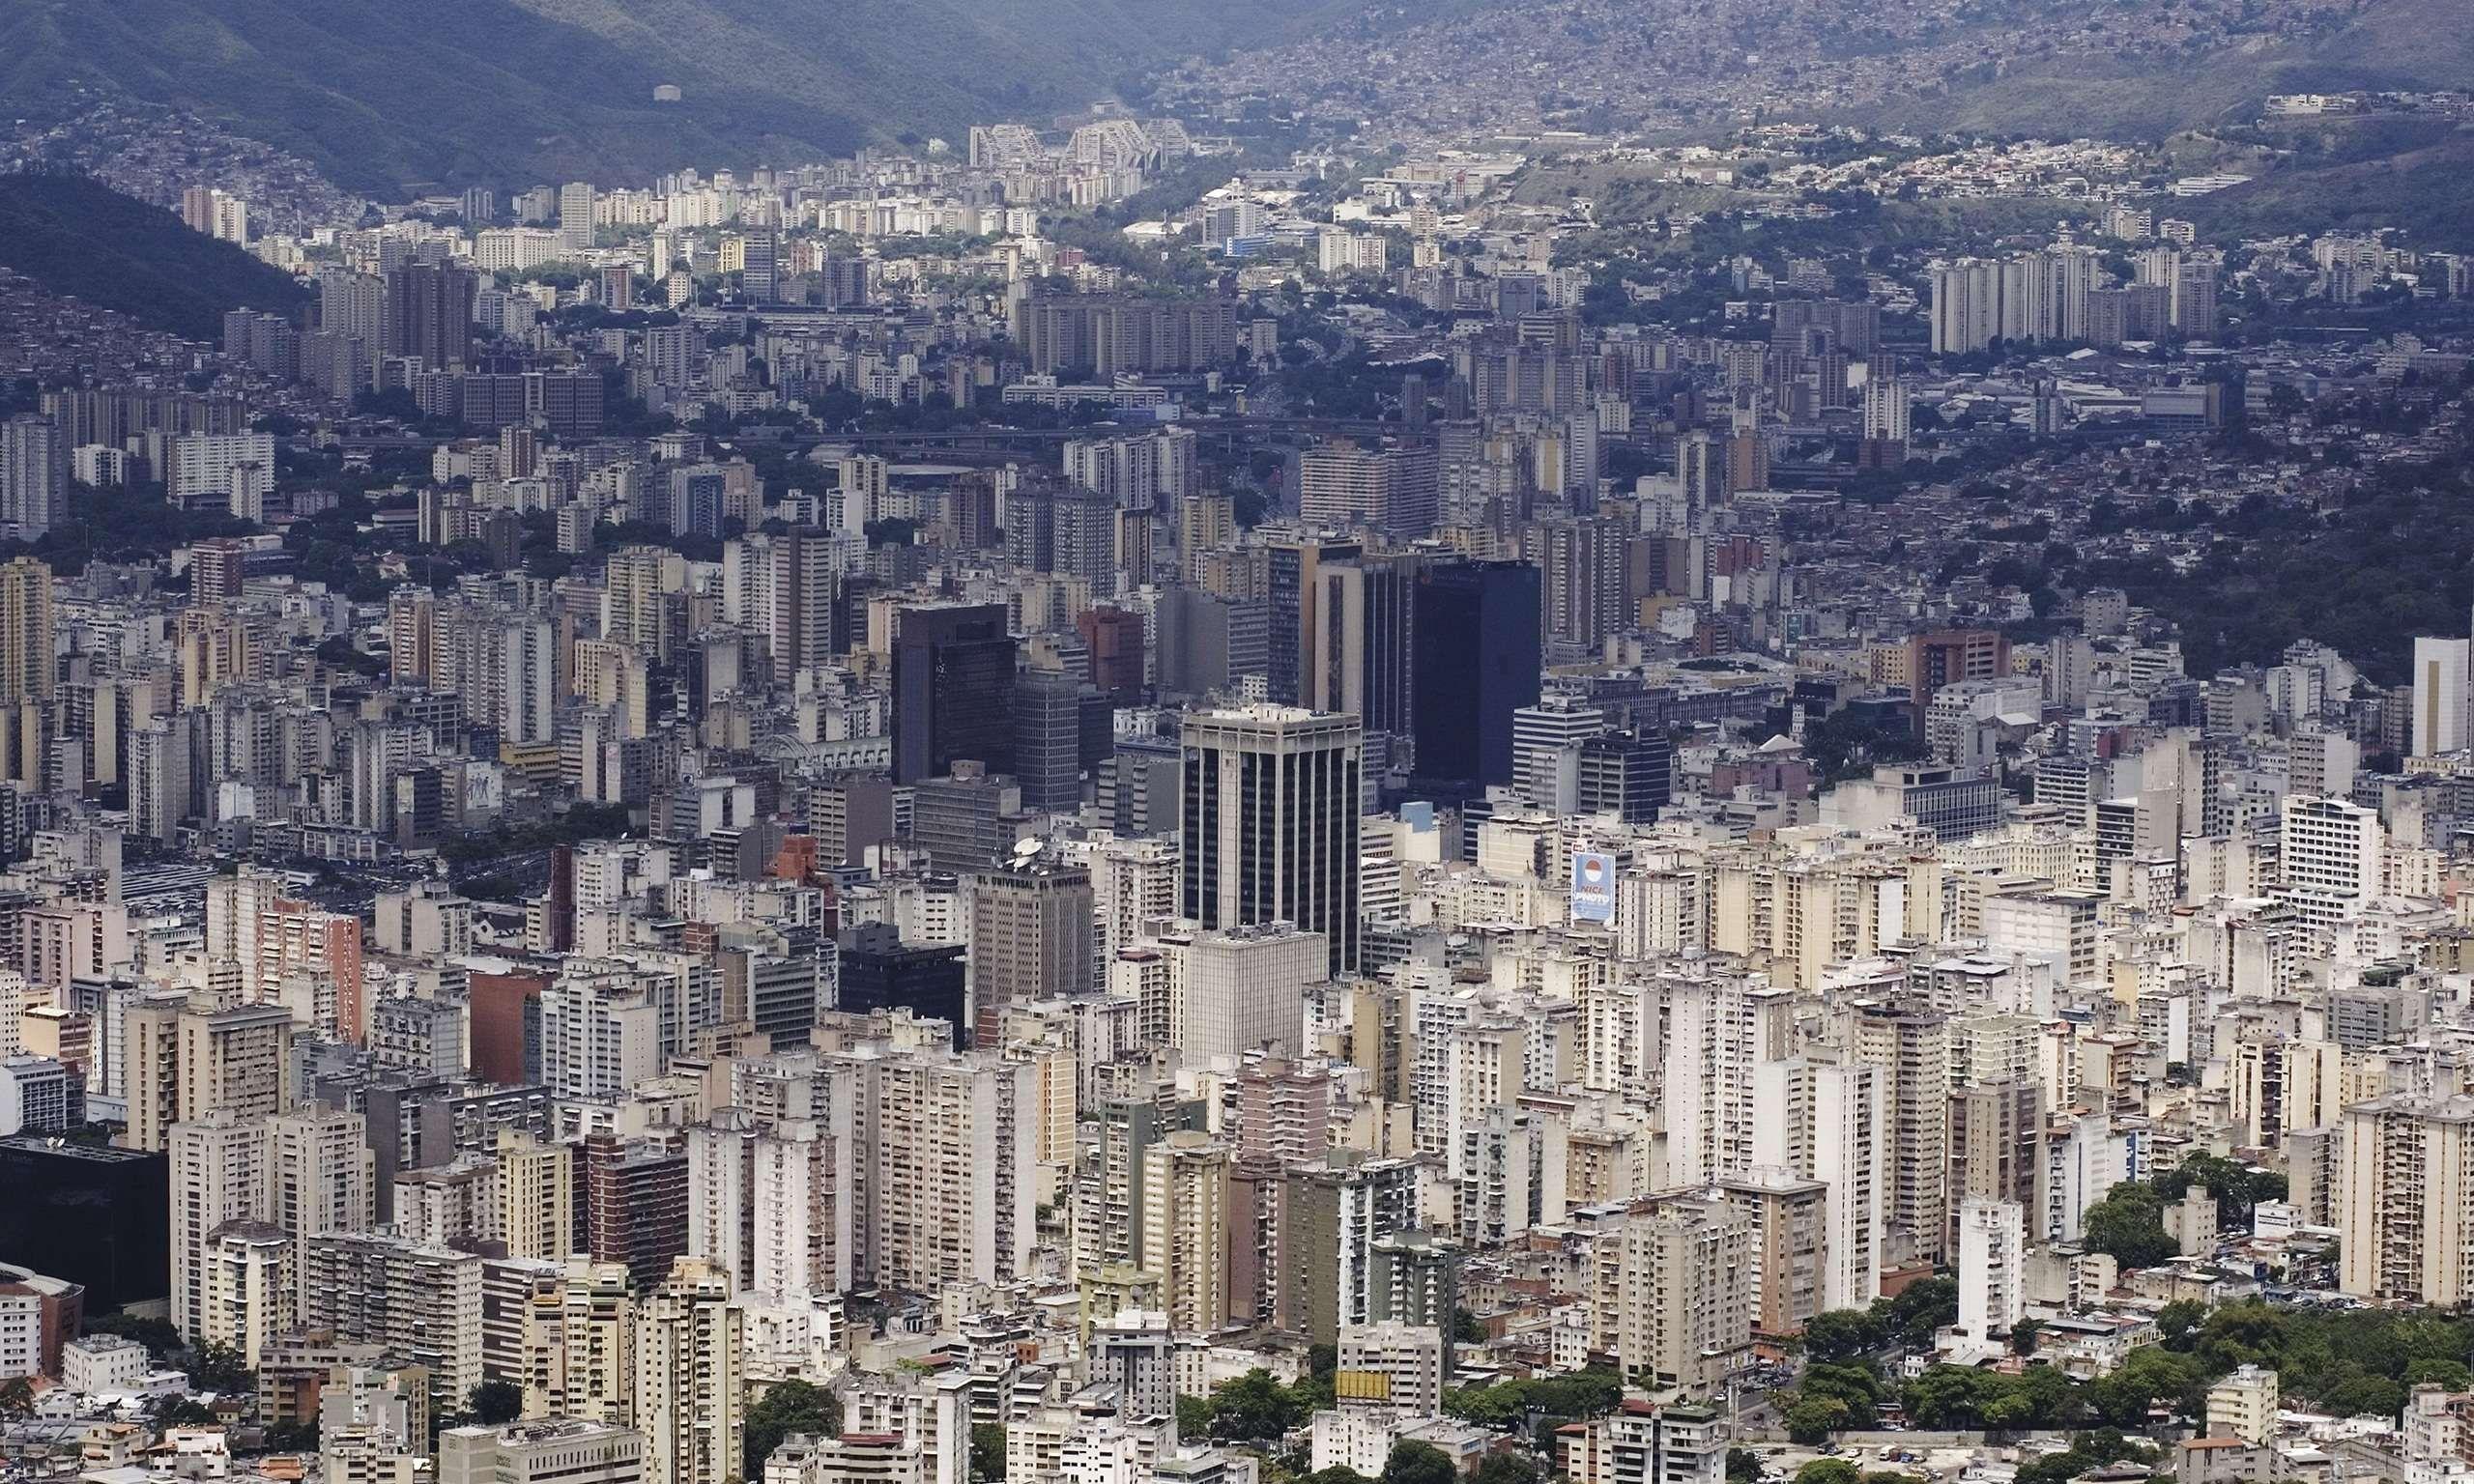 Caracas venezuela sur america wallpaper | 2560x1536 | 855572 ...